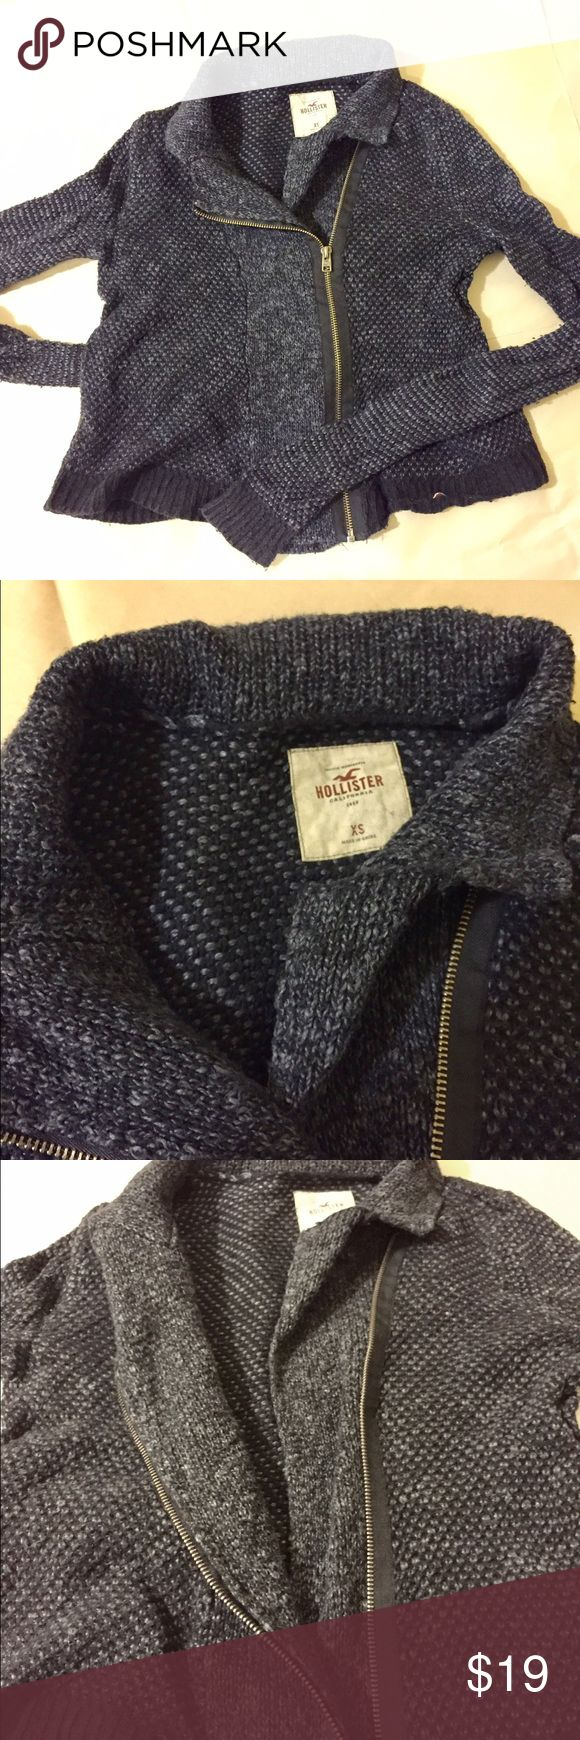 Hollister XS sweater coat Hollister sweater coat, size XS Hollister Sweaters